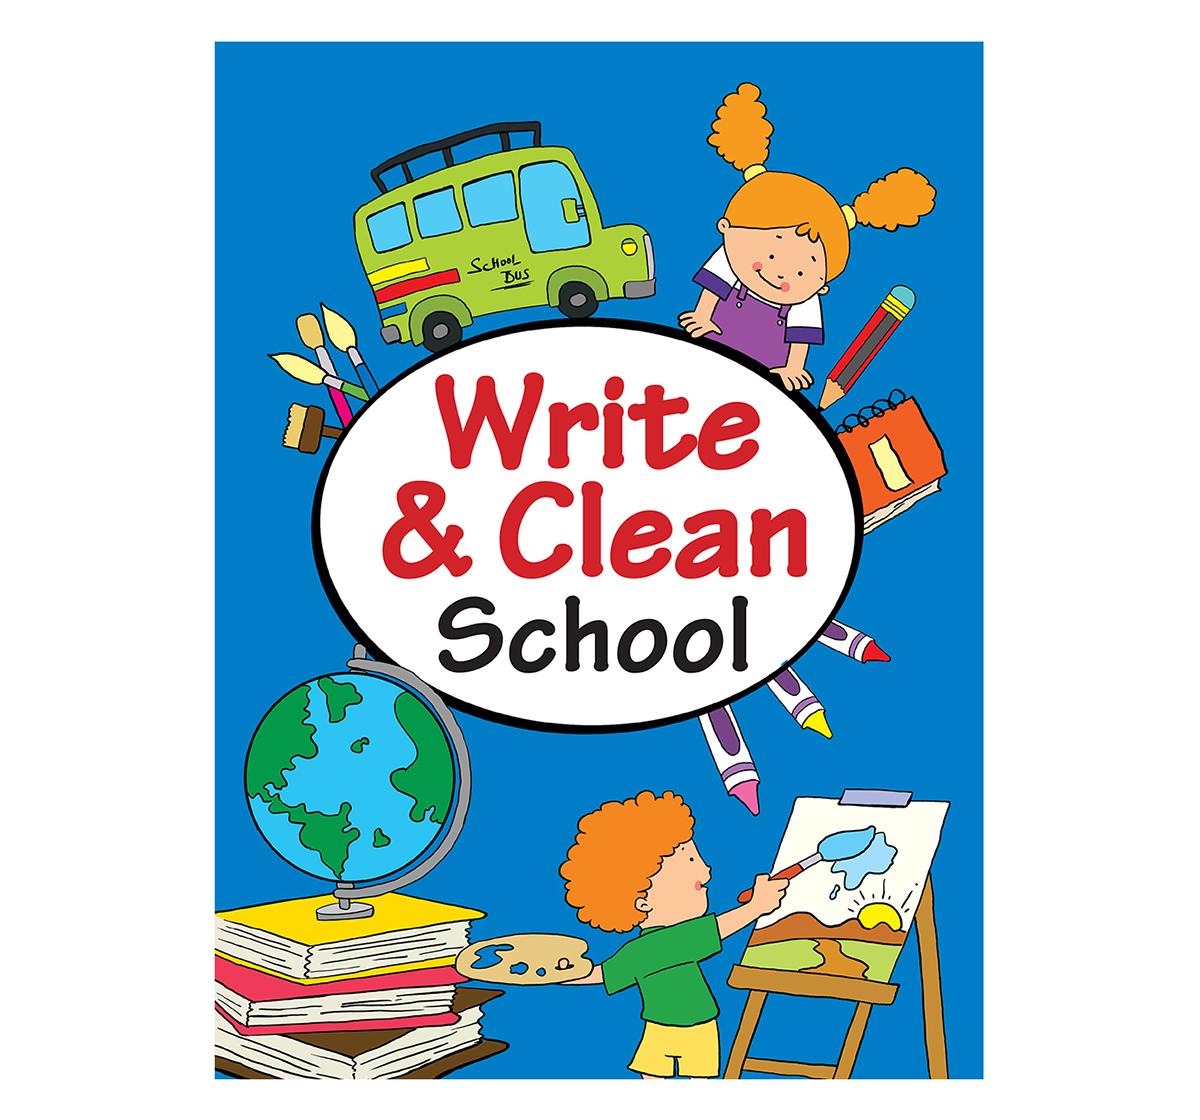 Om Kidz | Om Kidz: Write & Clean School, 16 Pages Book, Paperback